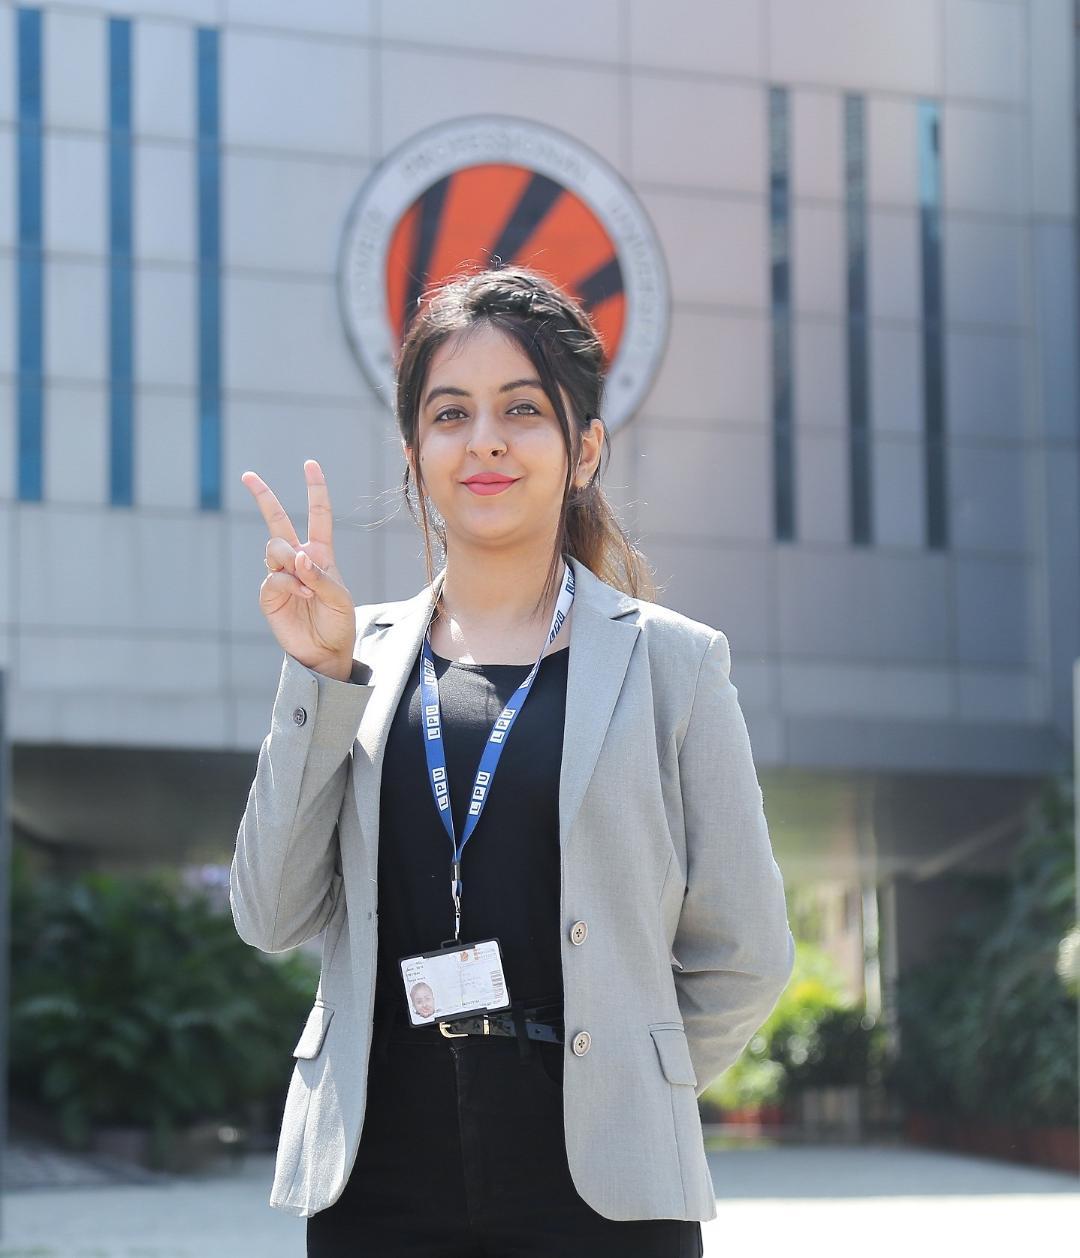 LPU Engineering Student bags Rs 42 lakh Job in Microsoft